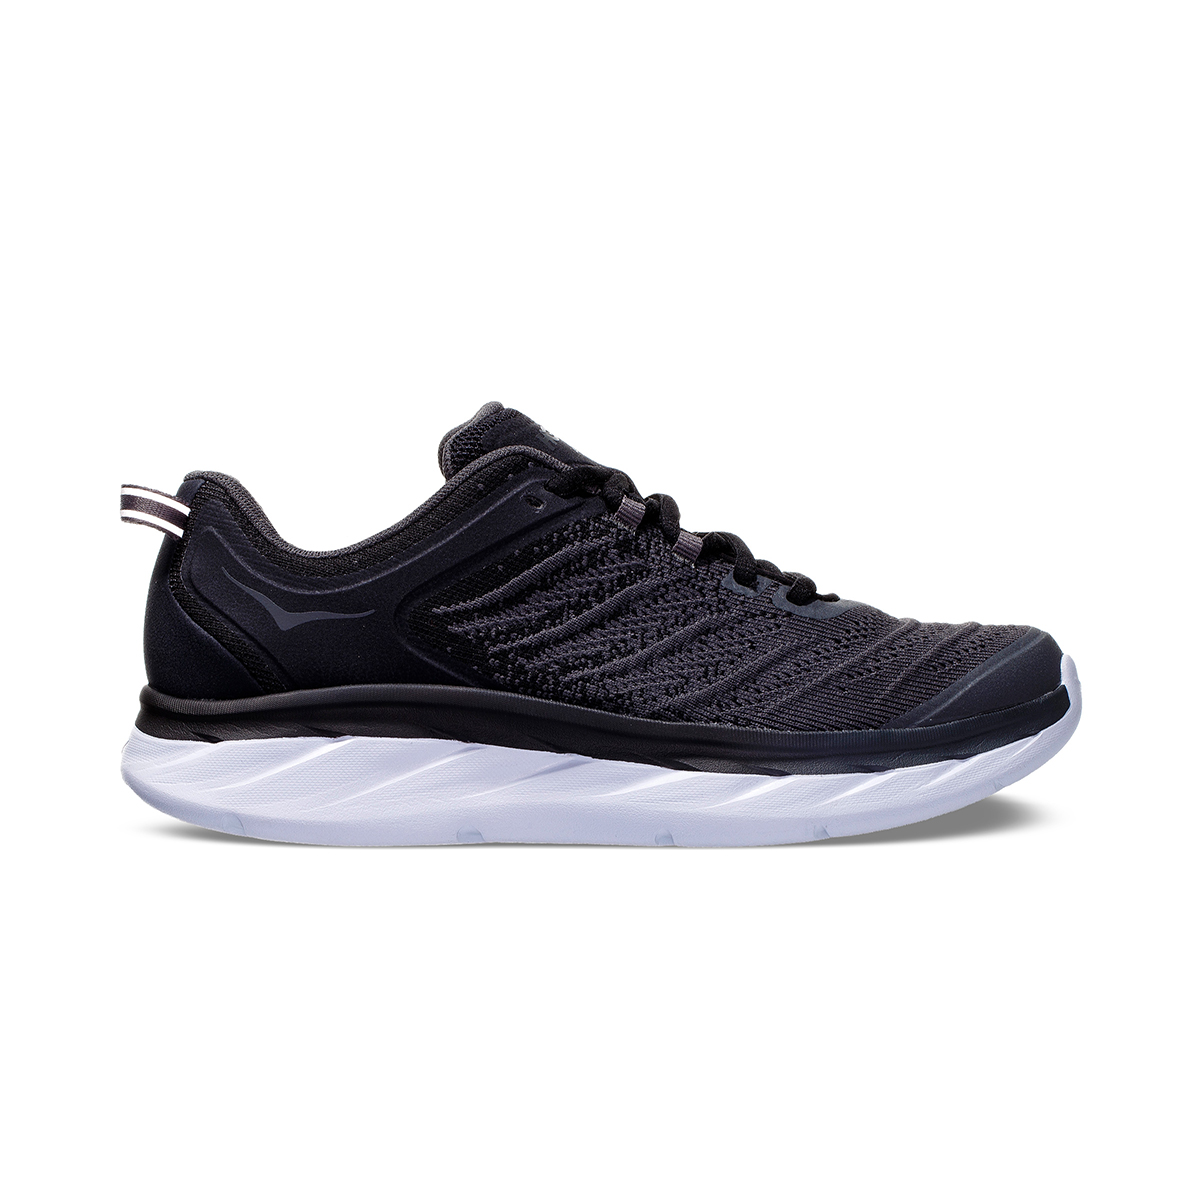 Women's Hoka One One Akasa Running Shoe - Color: Black/Dark Shadow - Size: 5 - Width: Regular, Black/Dark Shadow, large, image 1